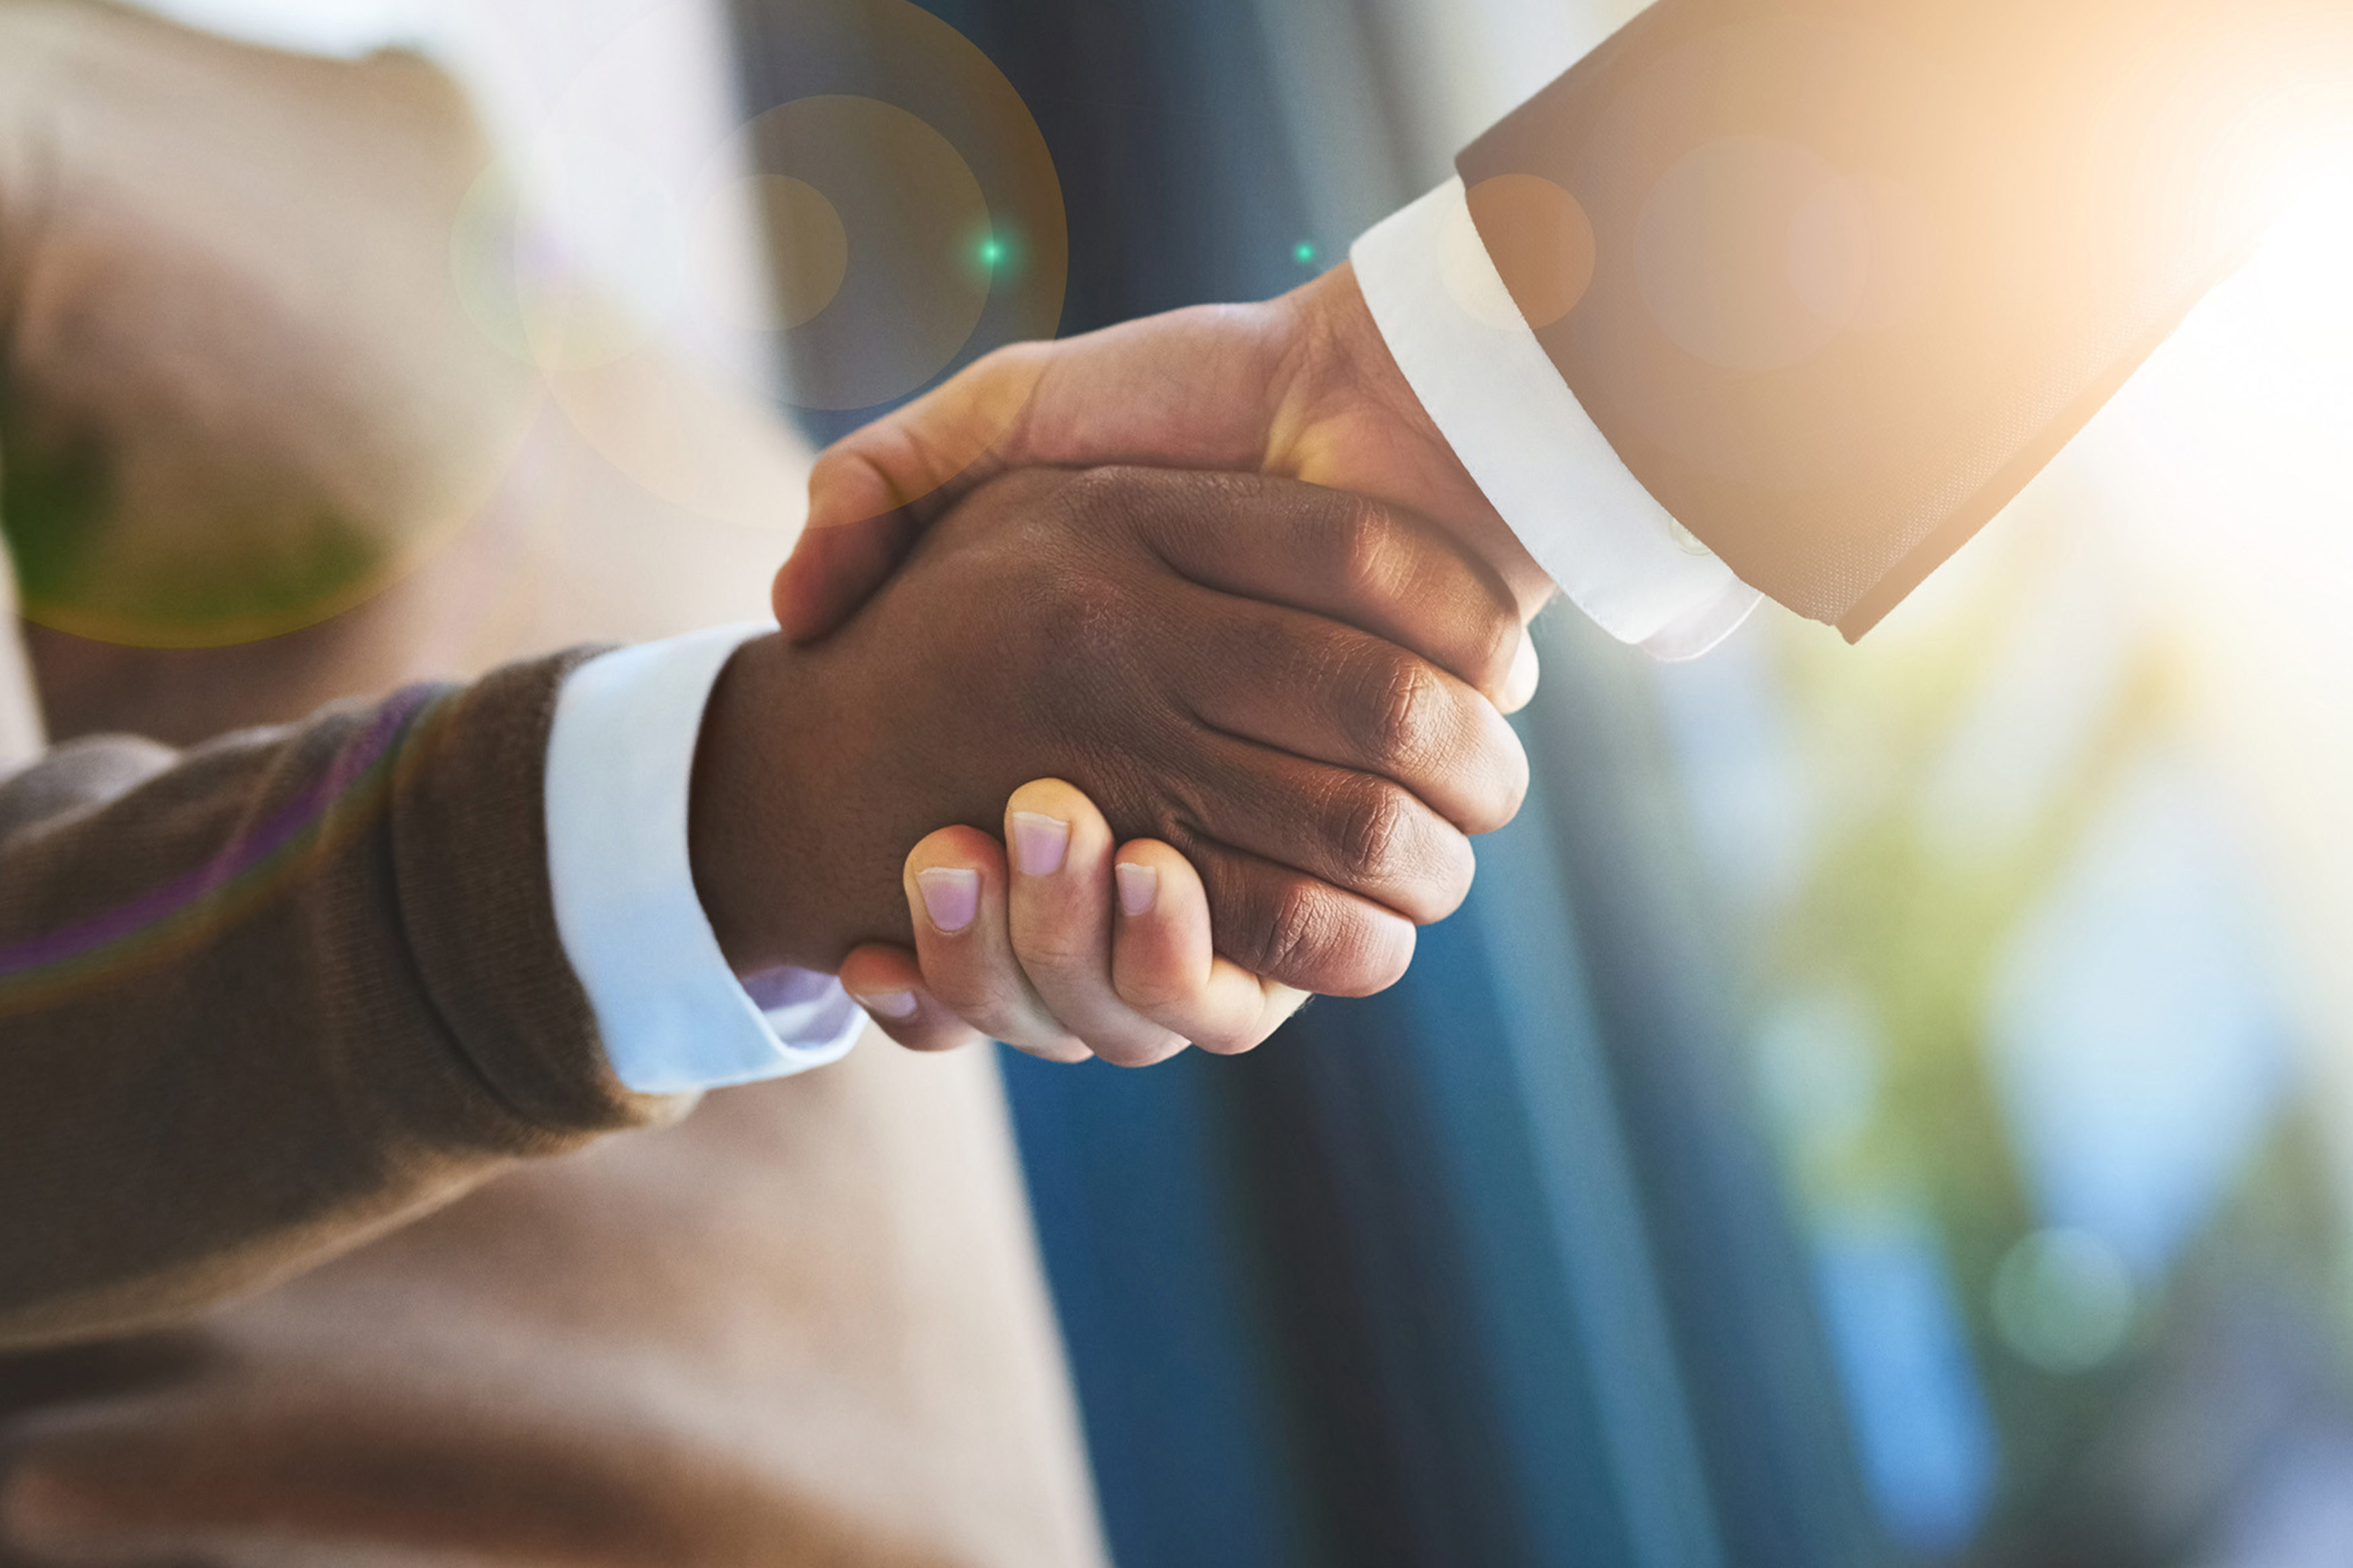 handshake-lobbying-3500x2333.jpg